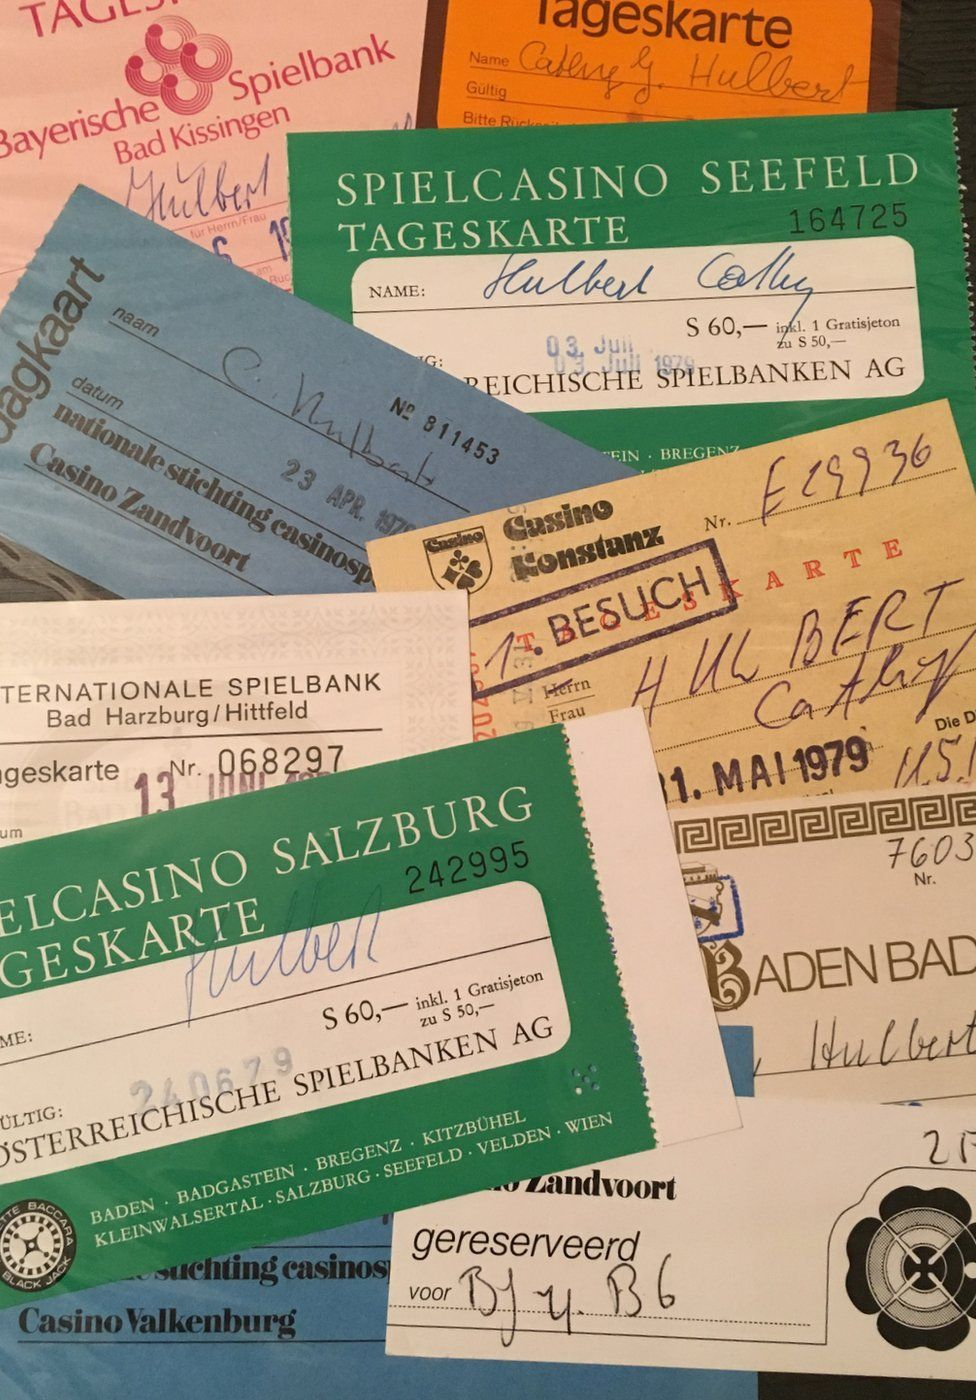 Ticket stubs to European casinos